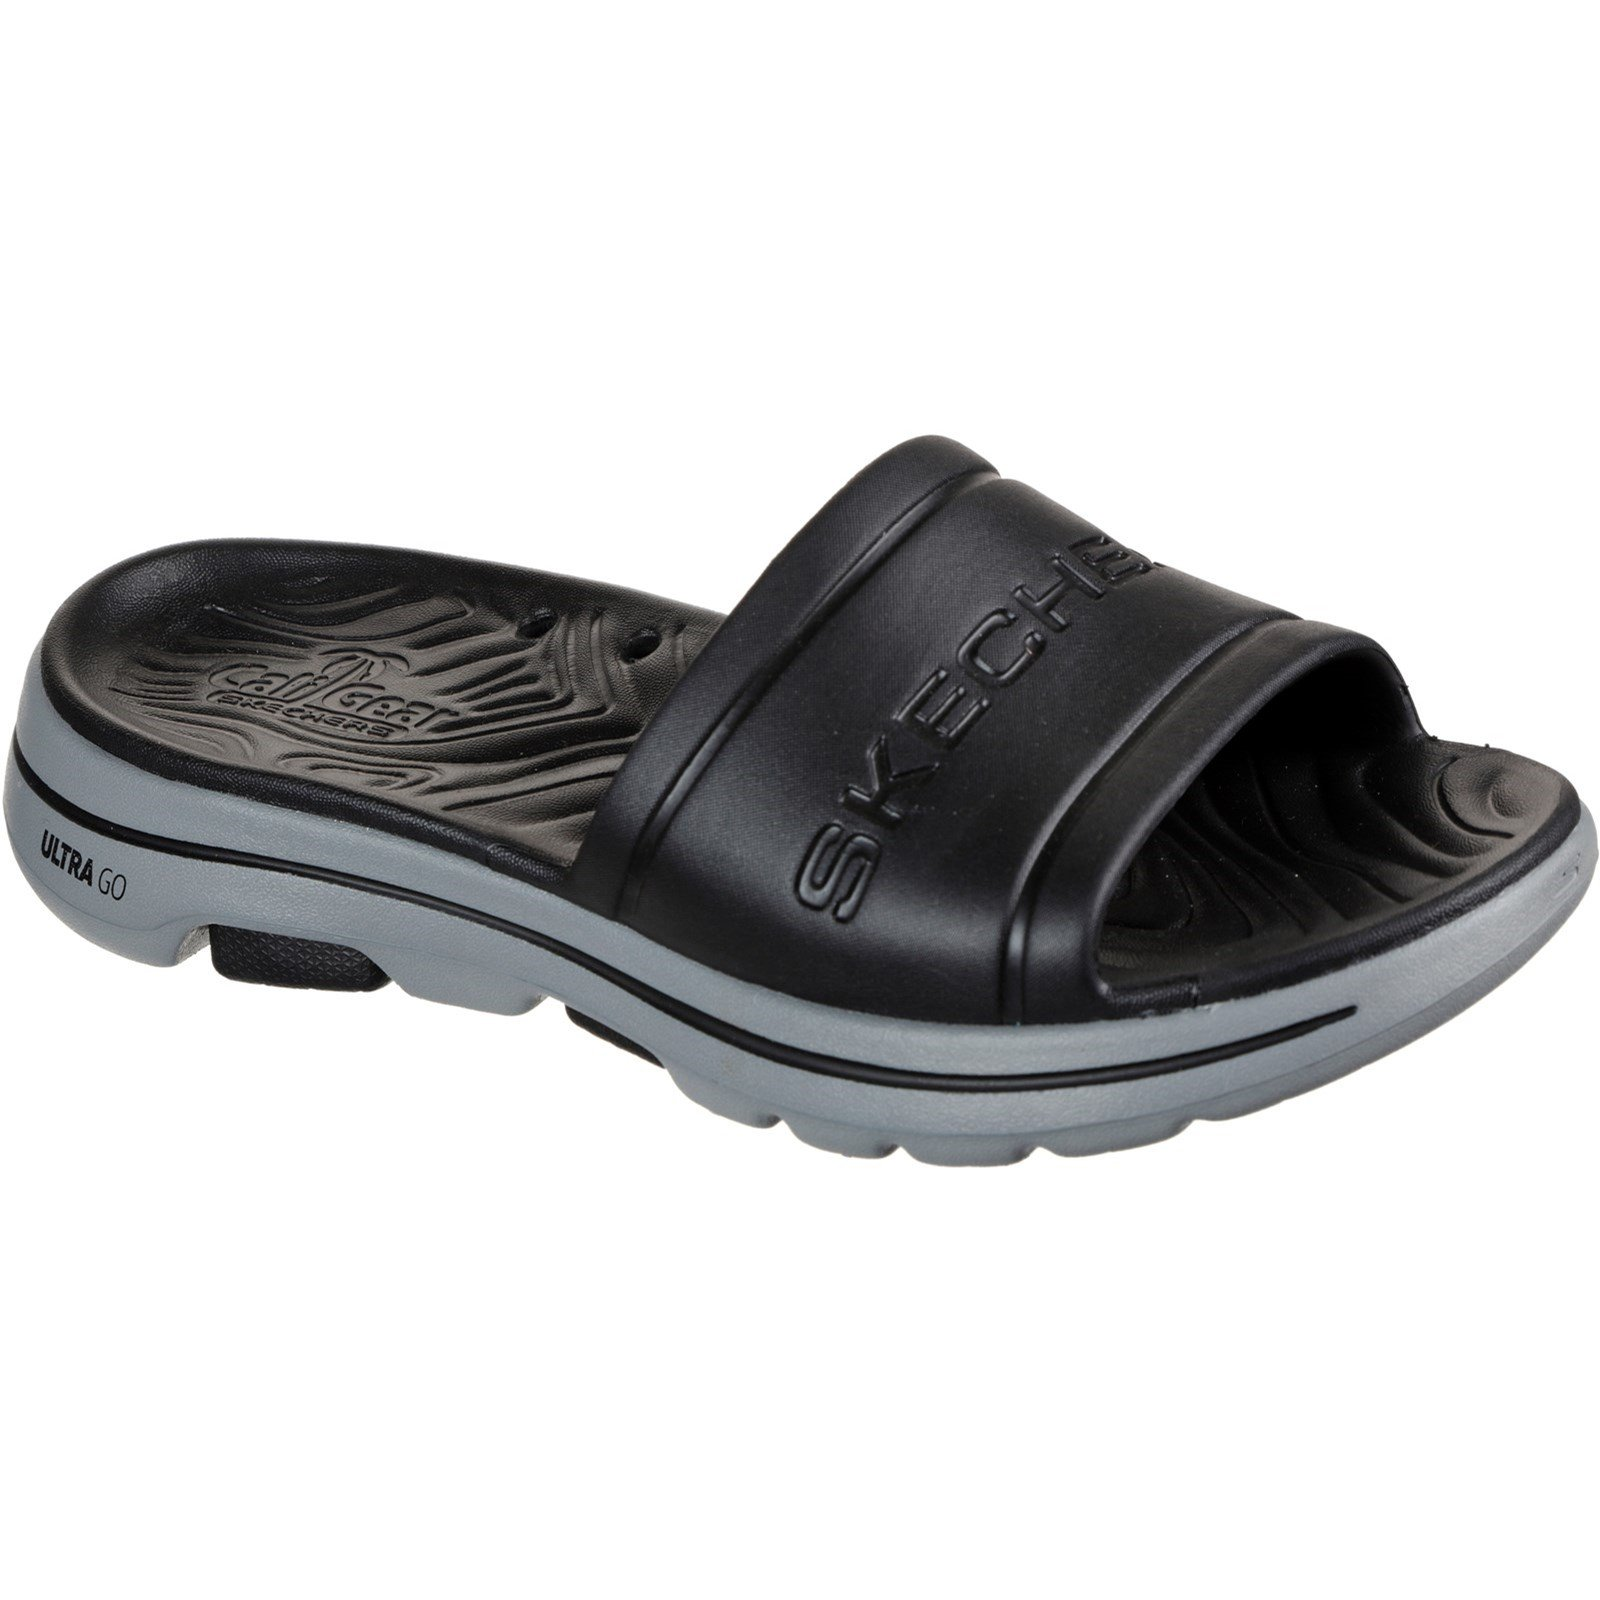 Skechers Men's Go Walk 5 Surfs Out Summer Sandal Various Colours 32207 - Black/Grey 12